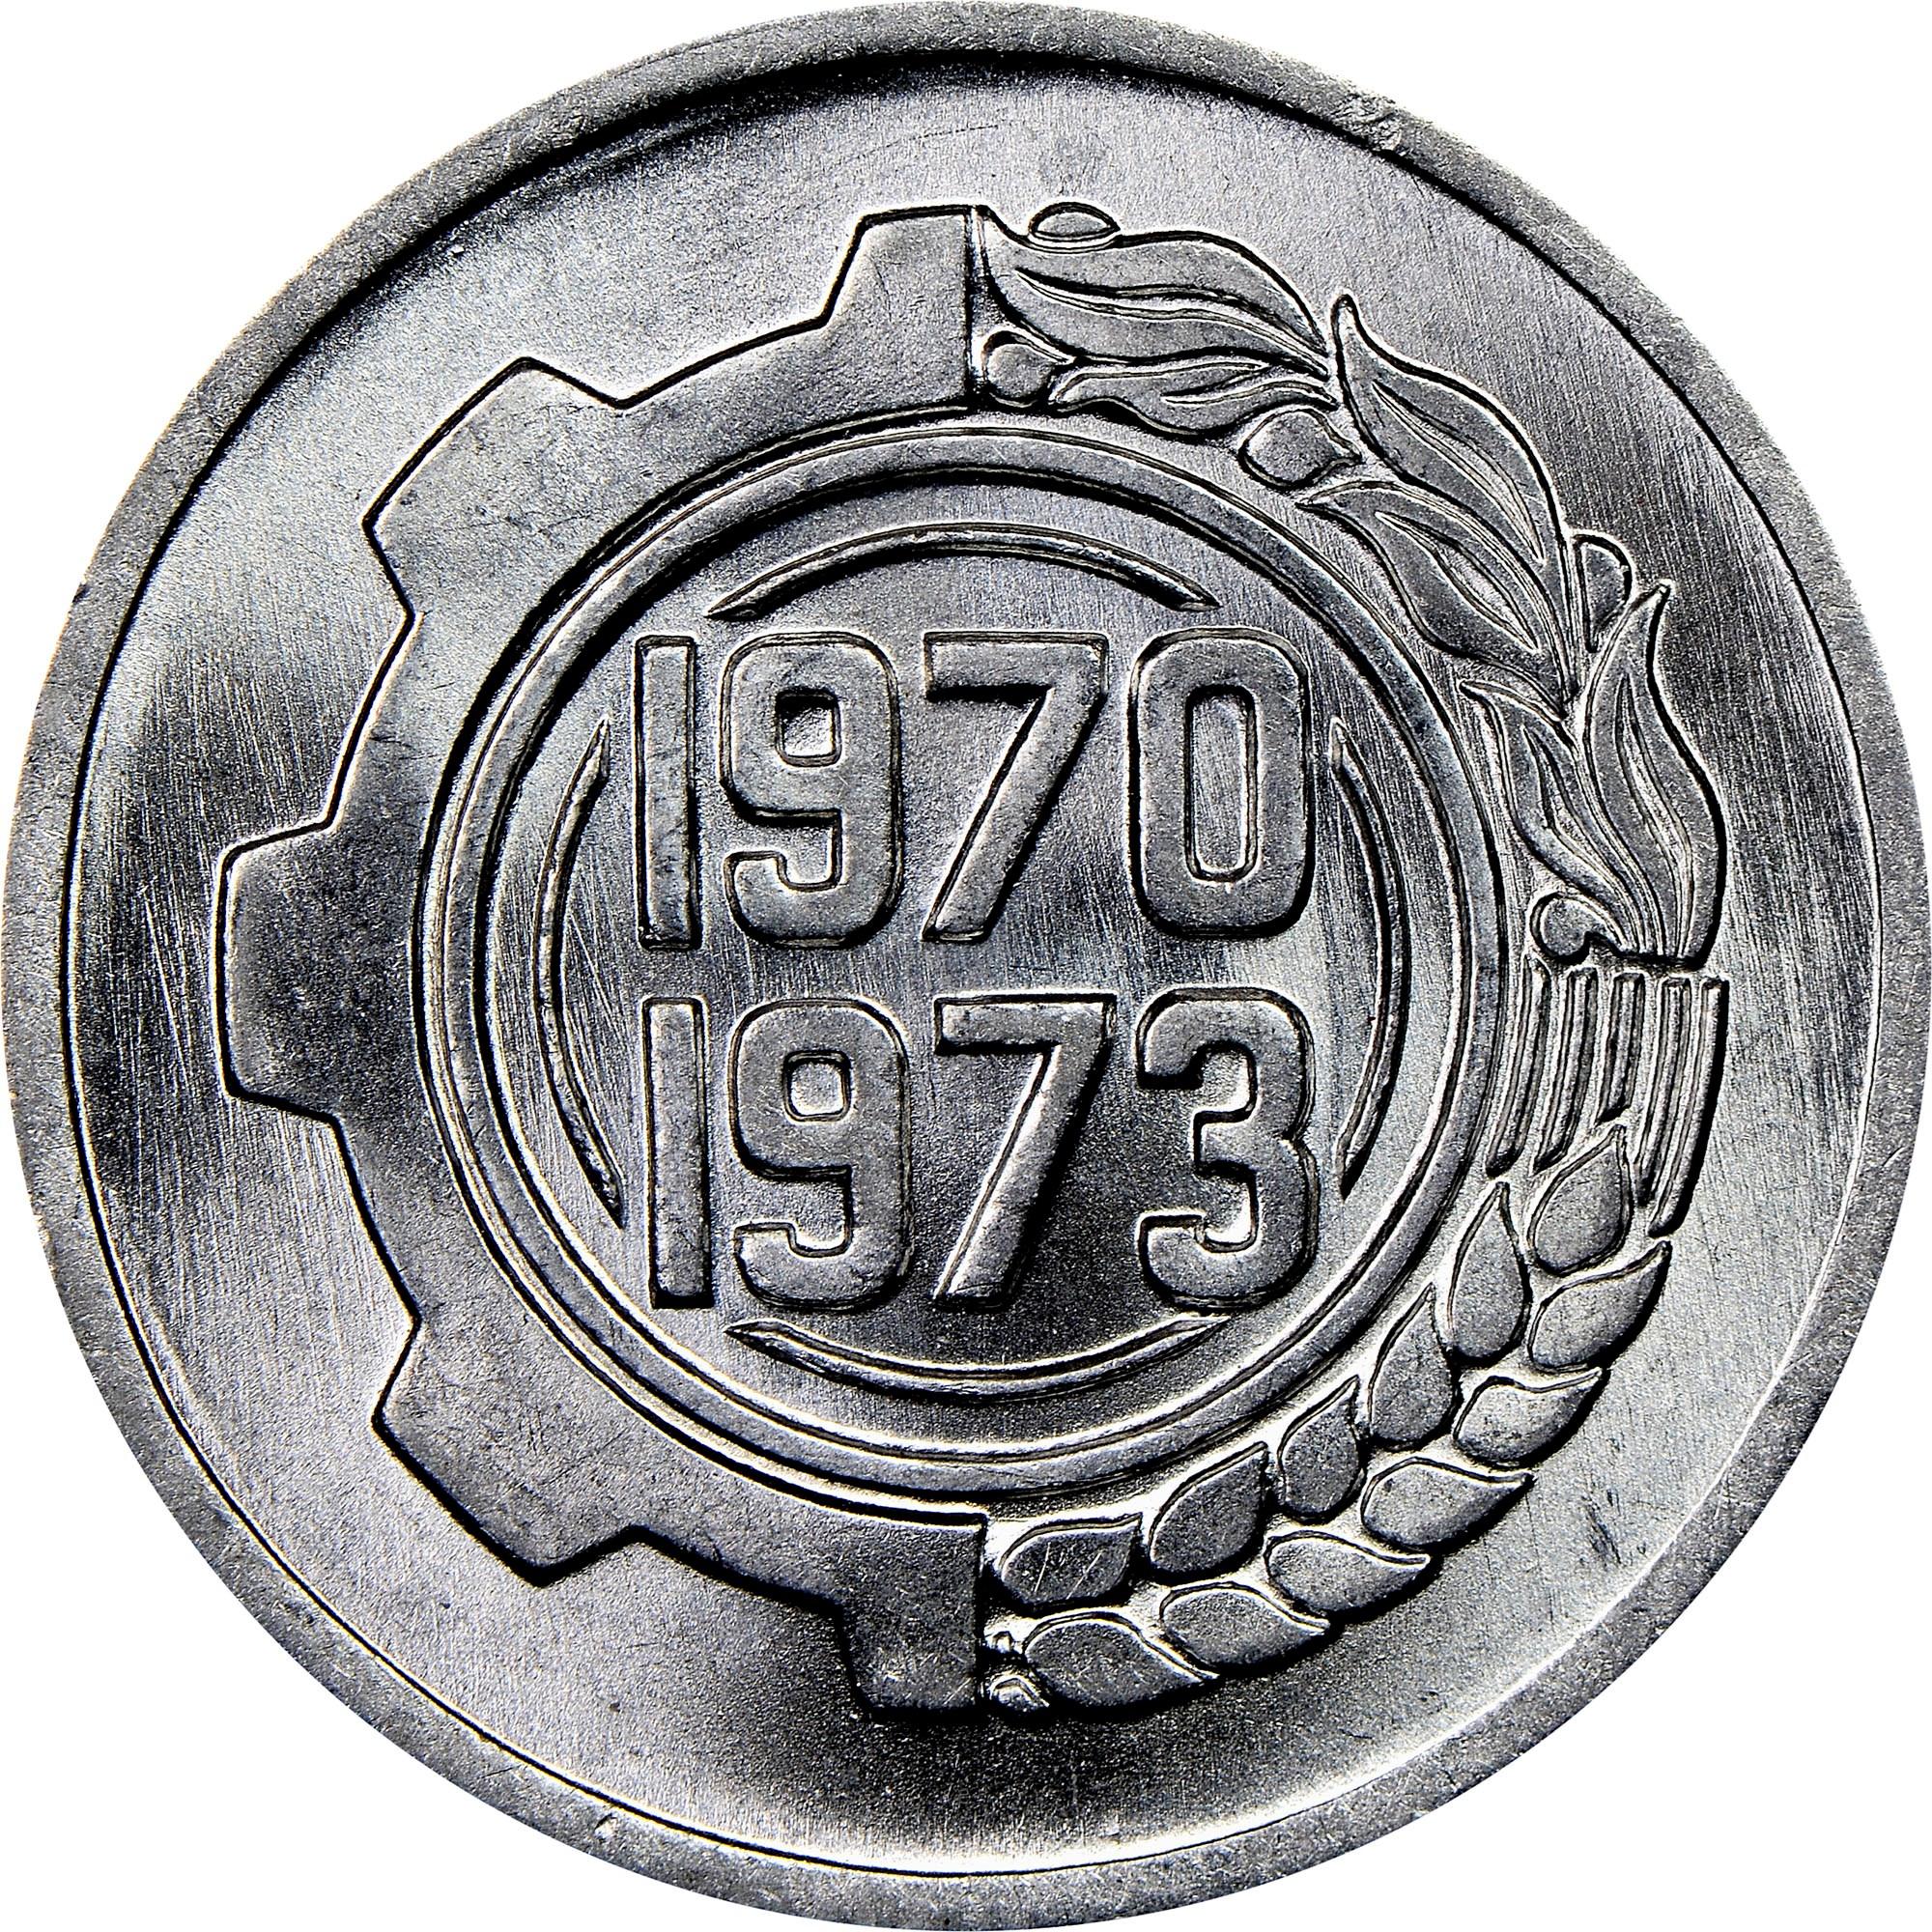 Algeria 5 Centimes reverse